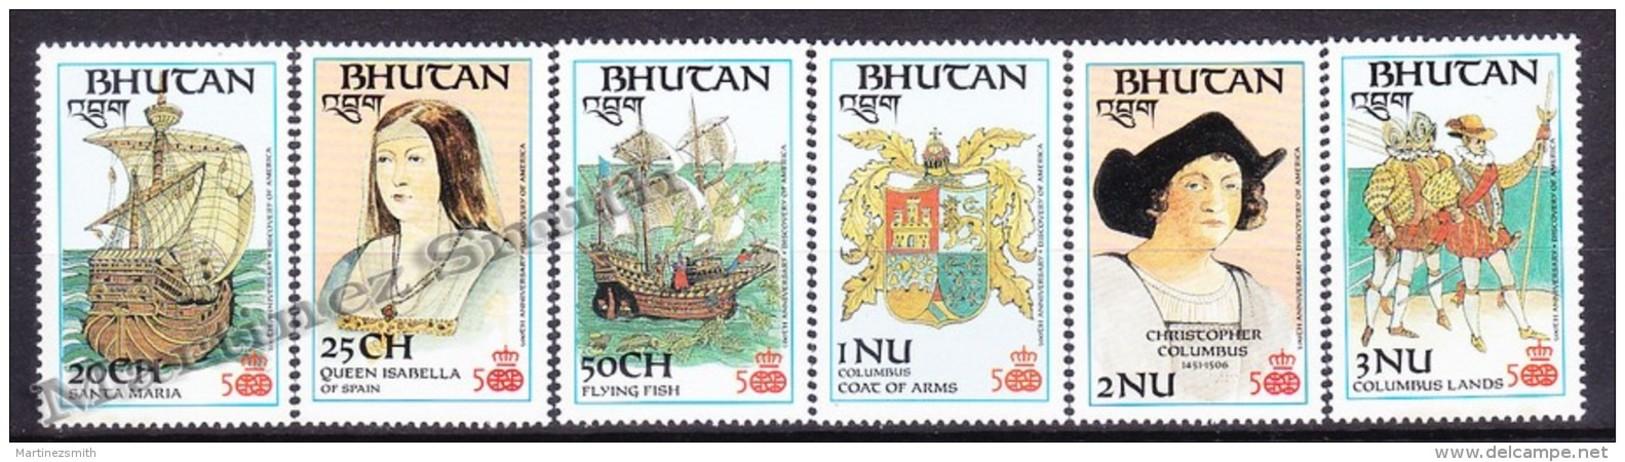 Bhutan - Bhoutan 1987 Yvert 756- 61, 500th Anniversary Christopher Columbus - MNH - Bhoutan